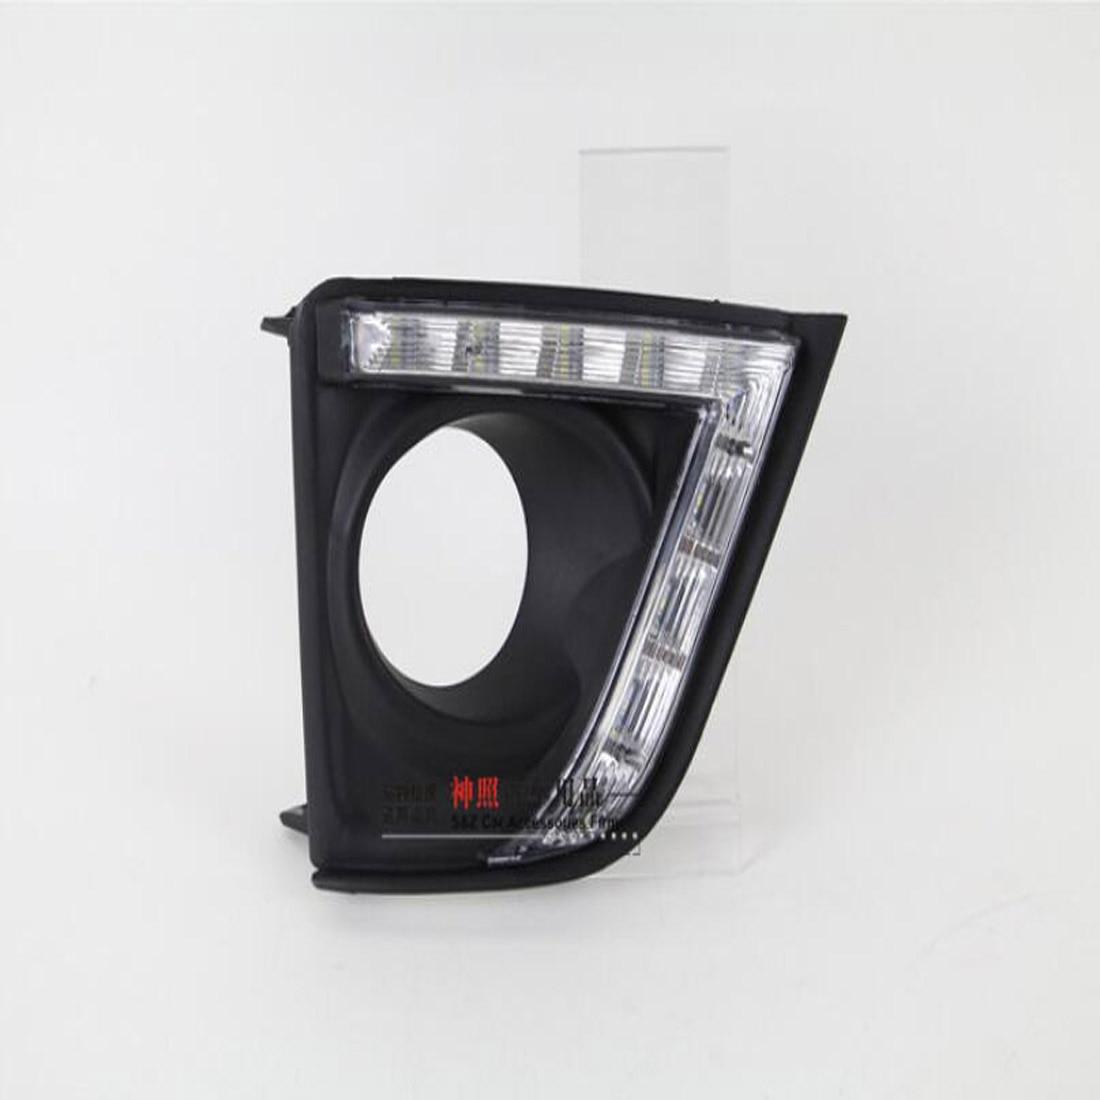 Dongzhen auto for toyota corolla 2011 2014 car daytime running light drl led turn signal